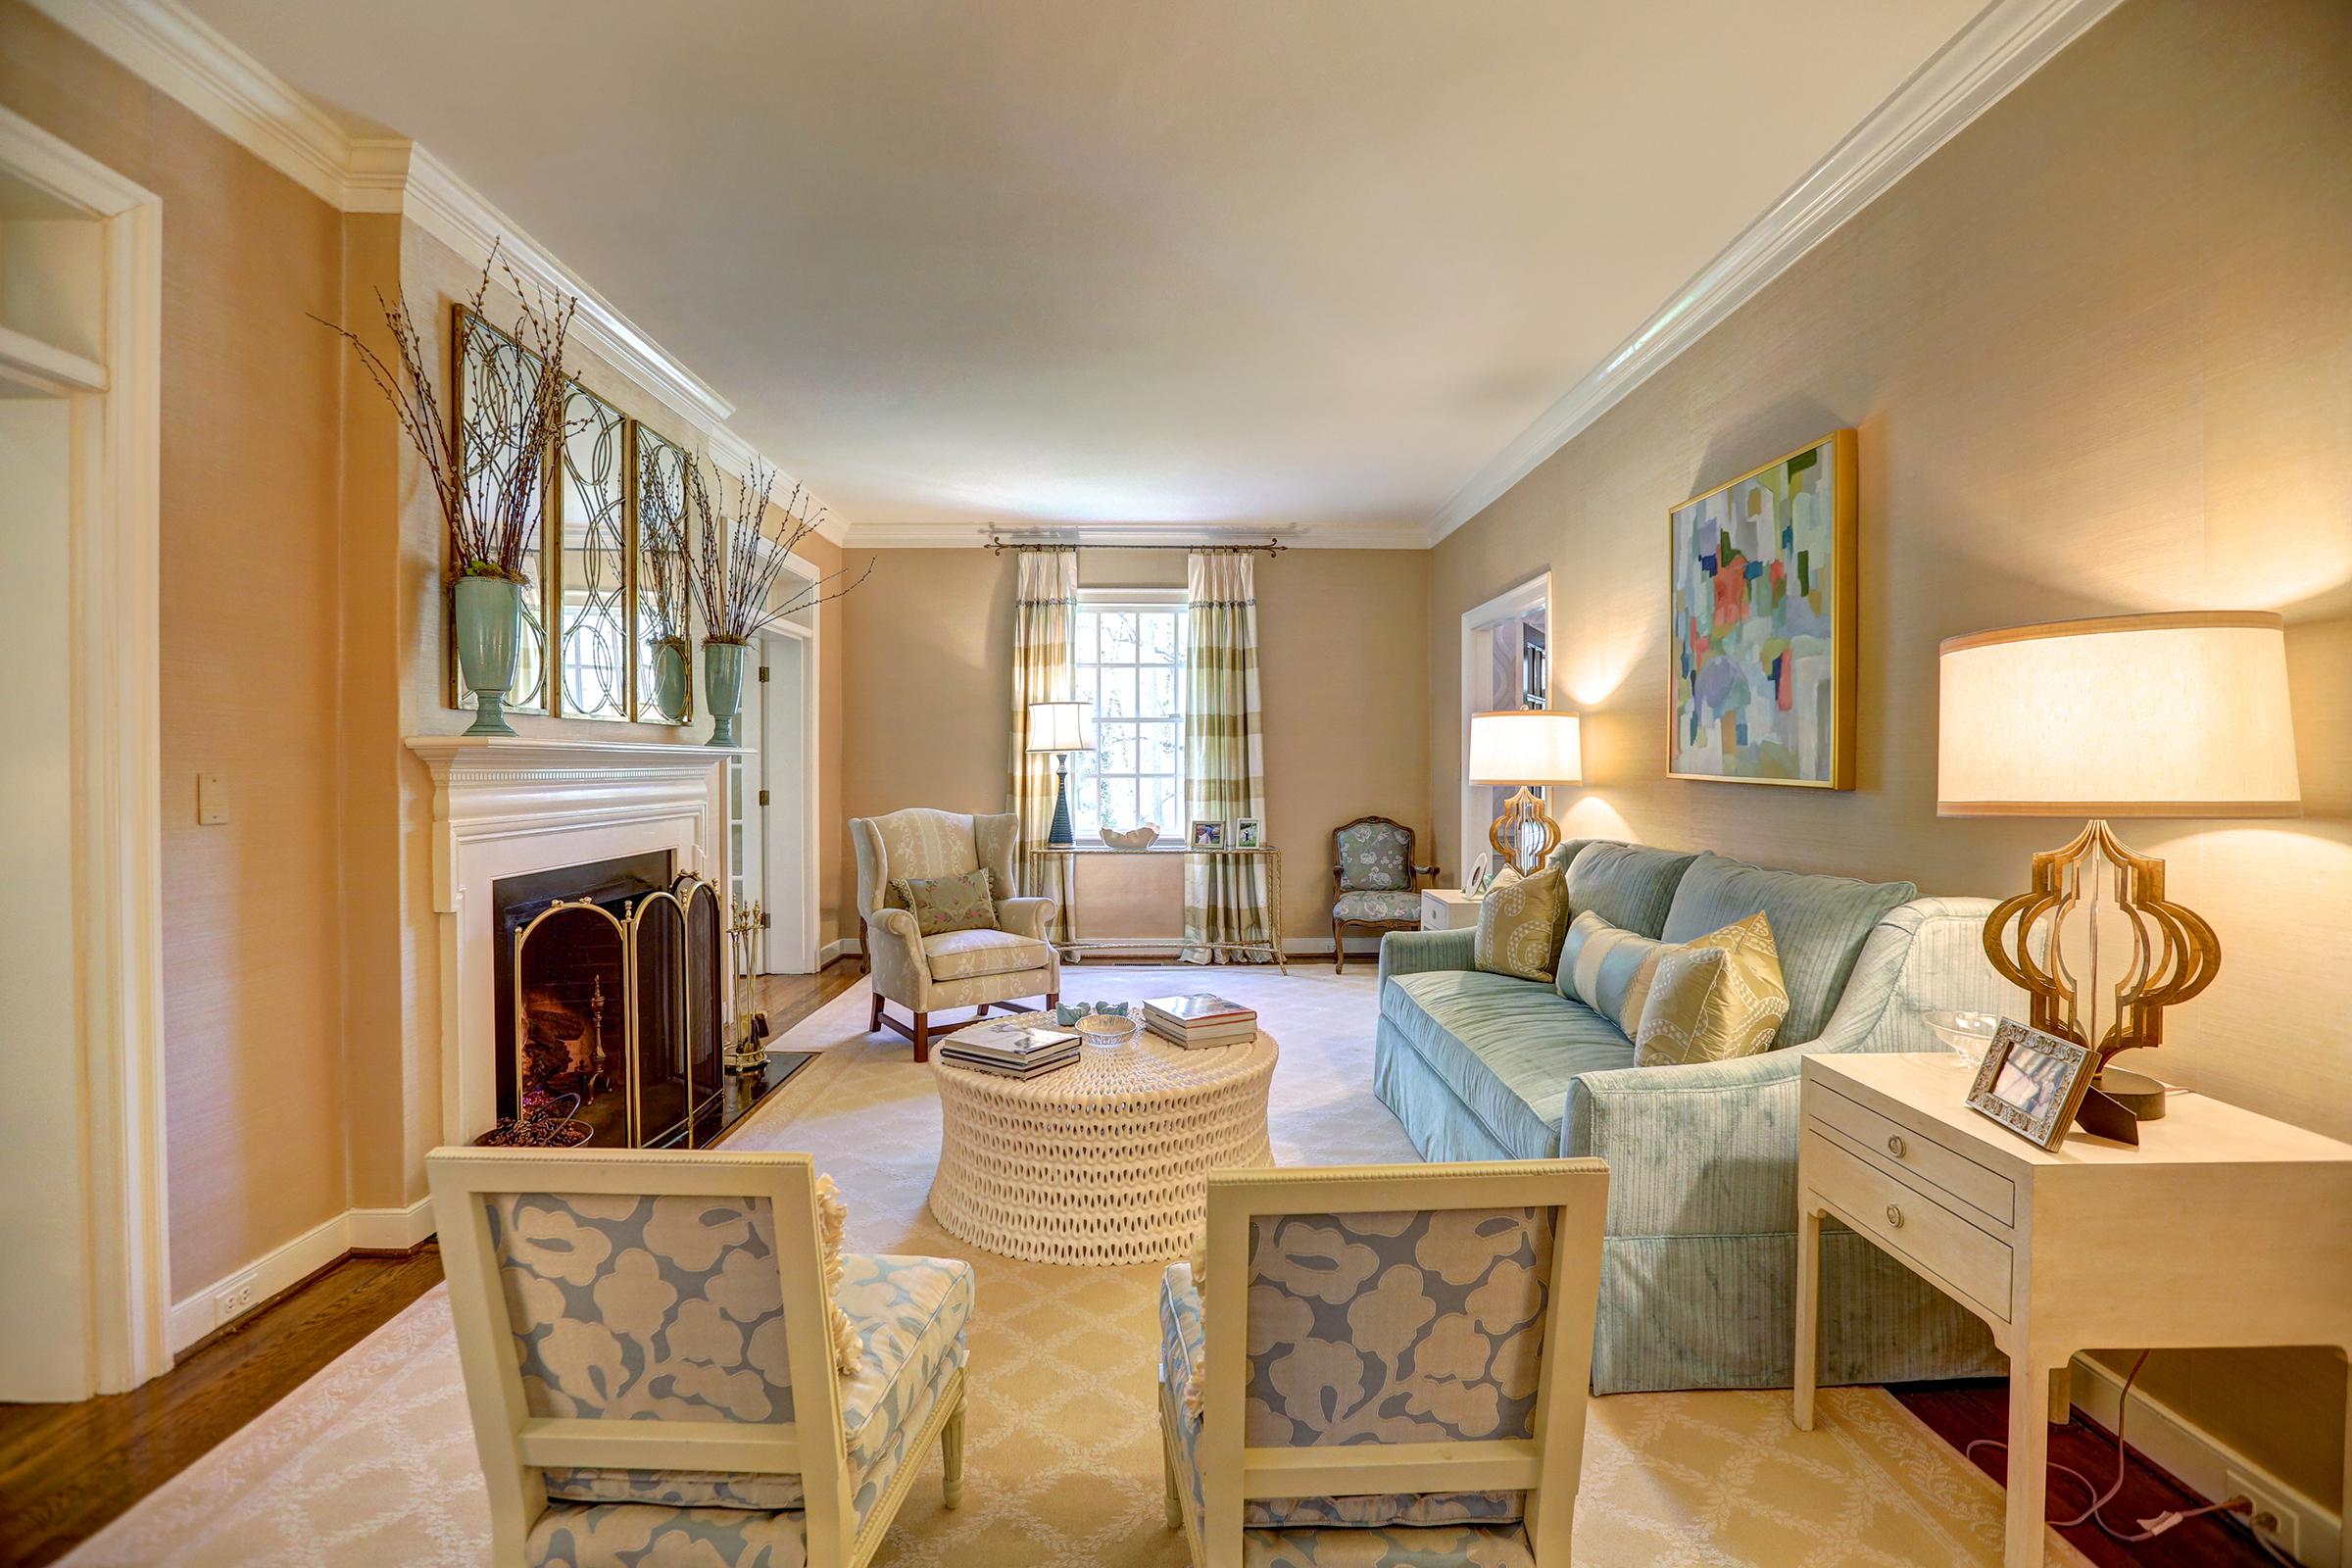 Living Room 2 Davenport Plageman Dedicated Real Estate Professionals